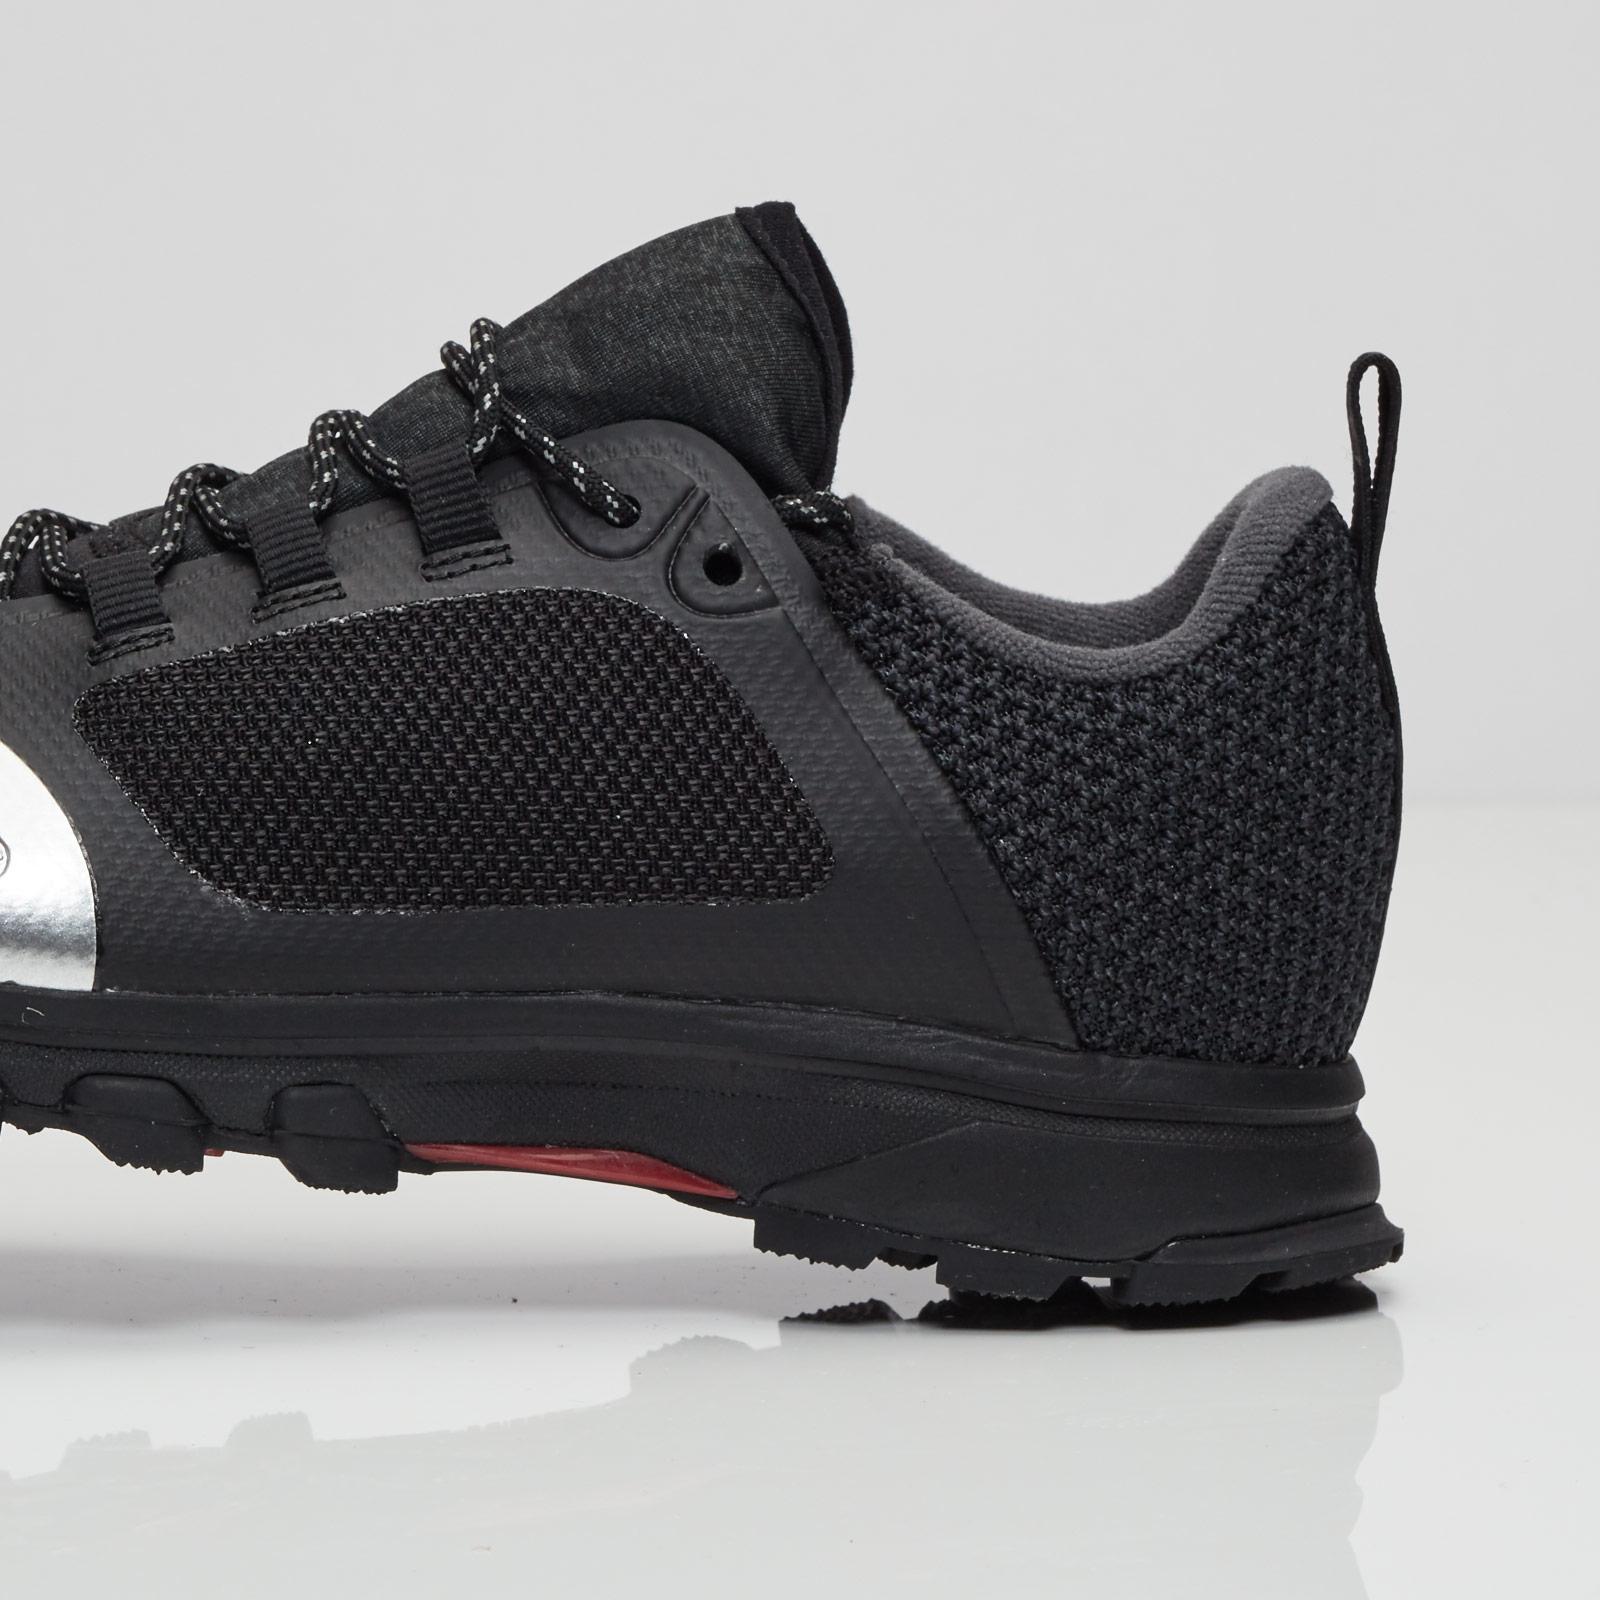 adidas adizero XT - Aq3707 - Sneakersnstuff  8684a2267a049